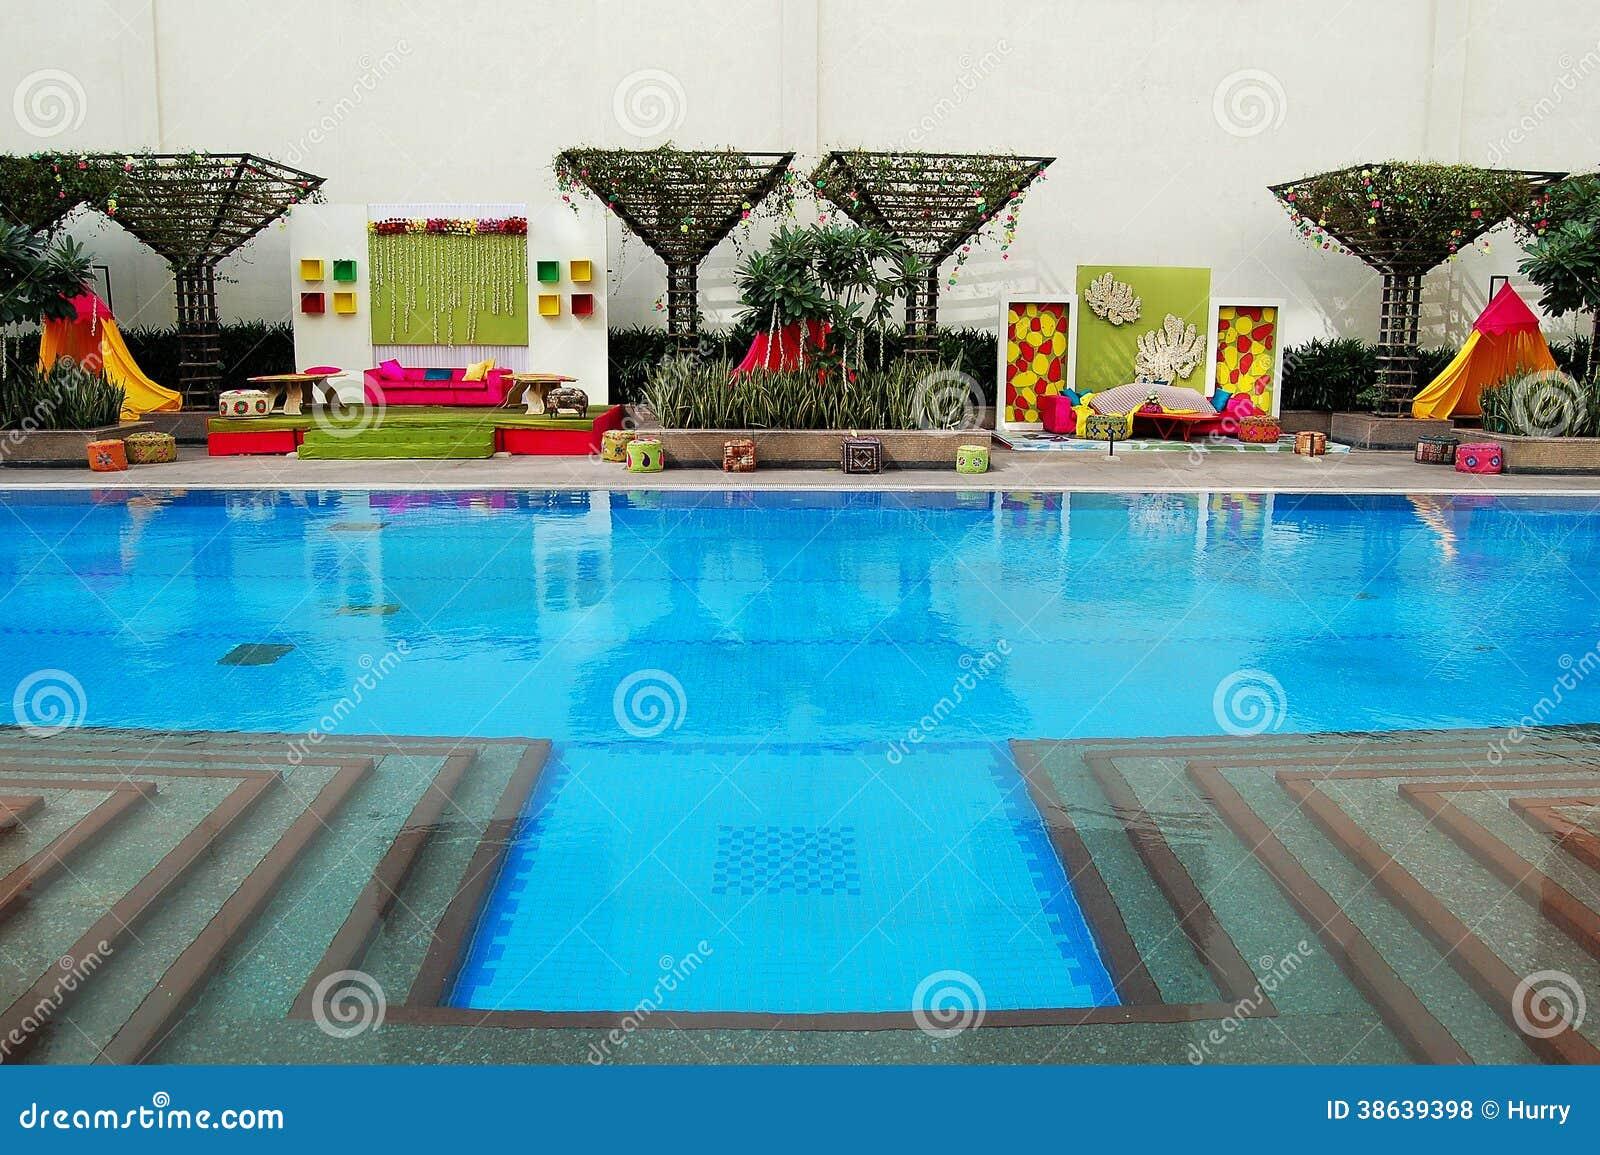 Indian Wedding Decorations Beside Pool Stock Photo Image